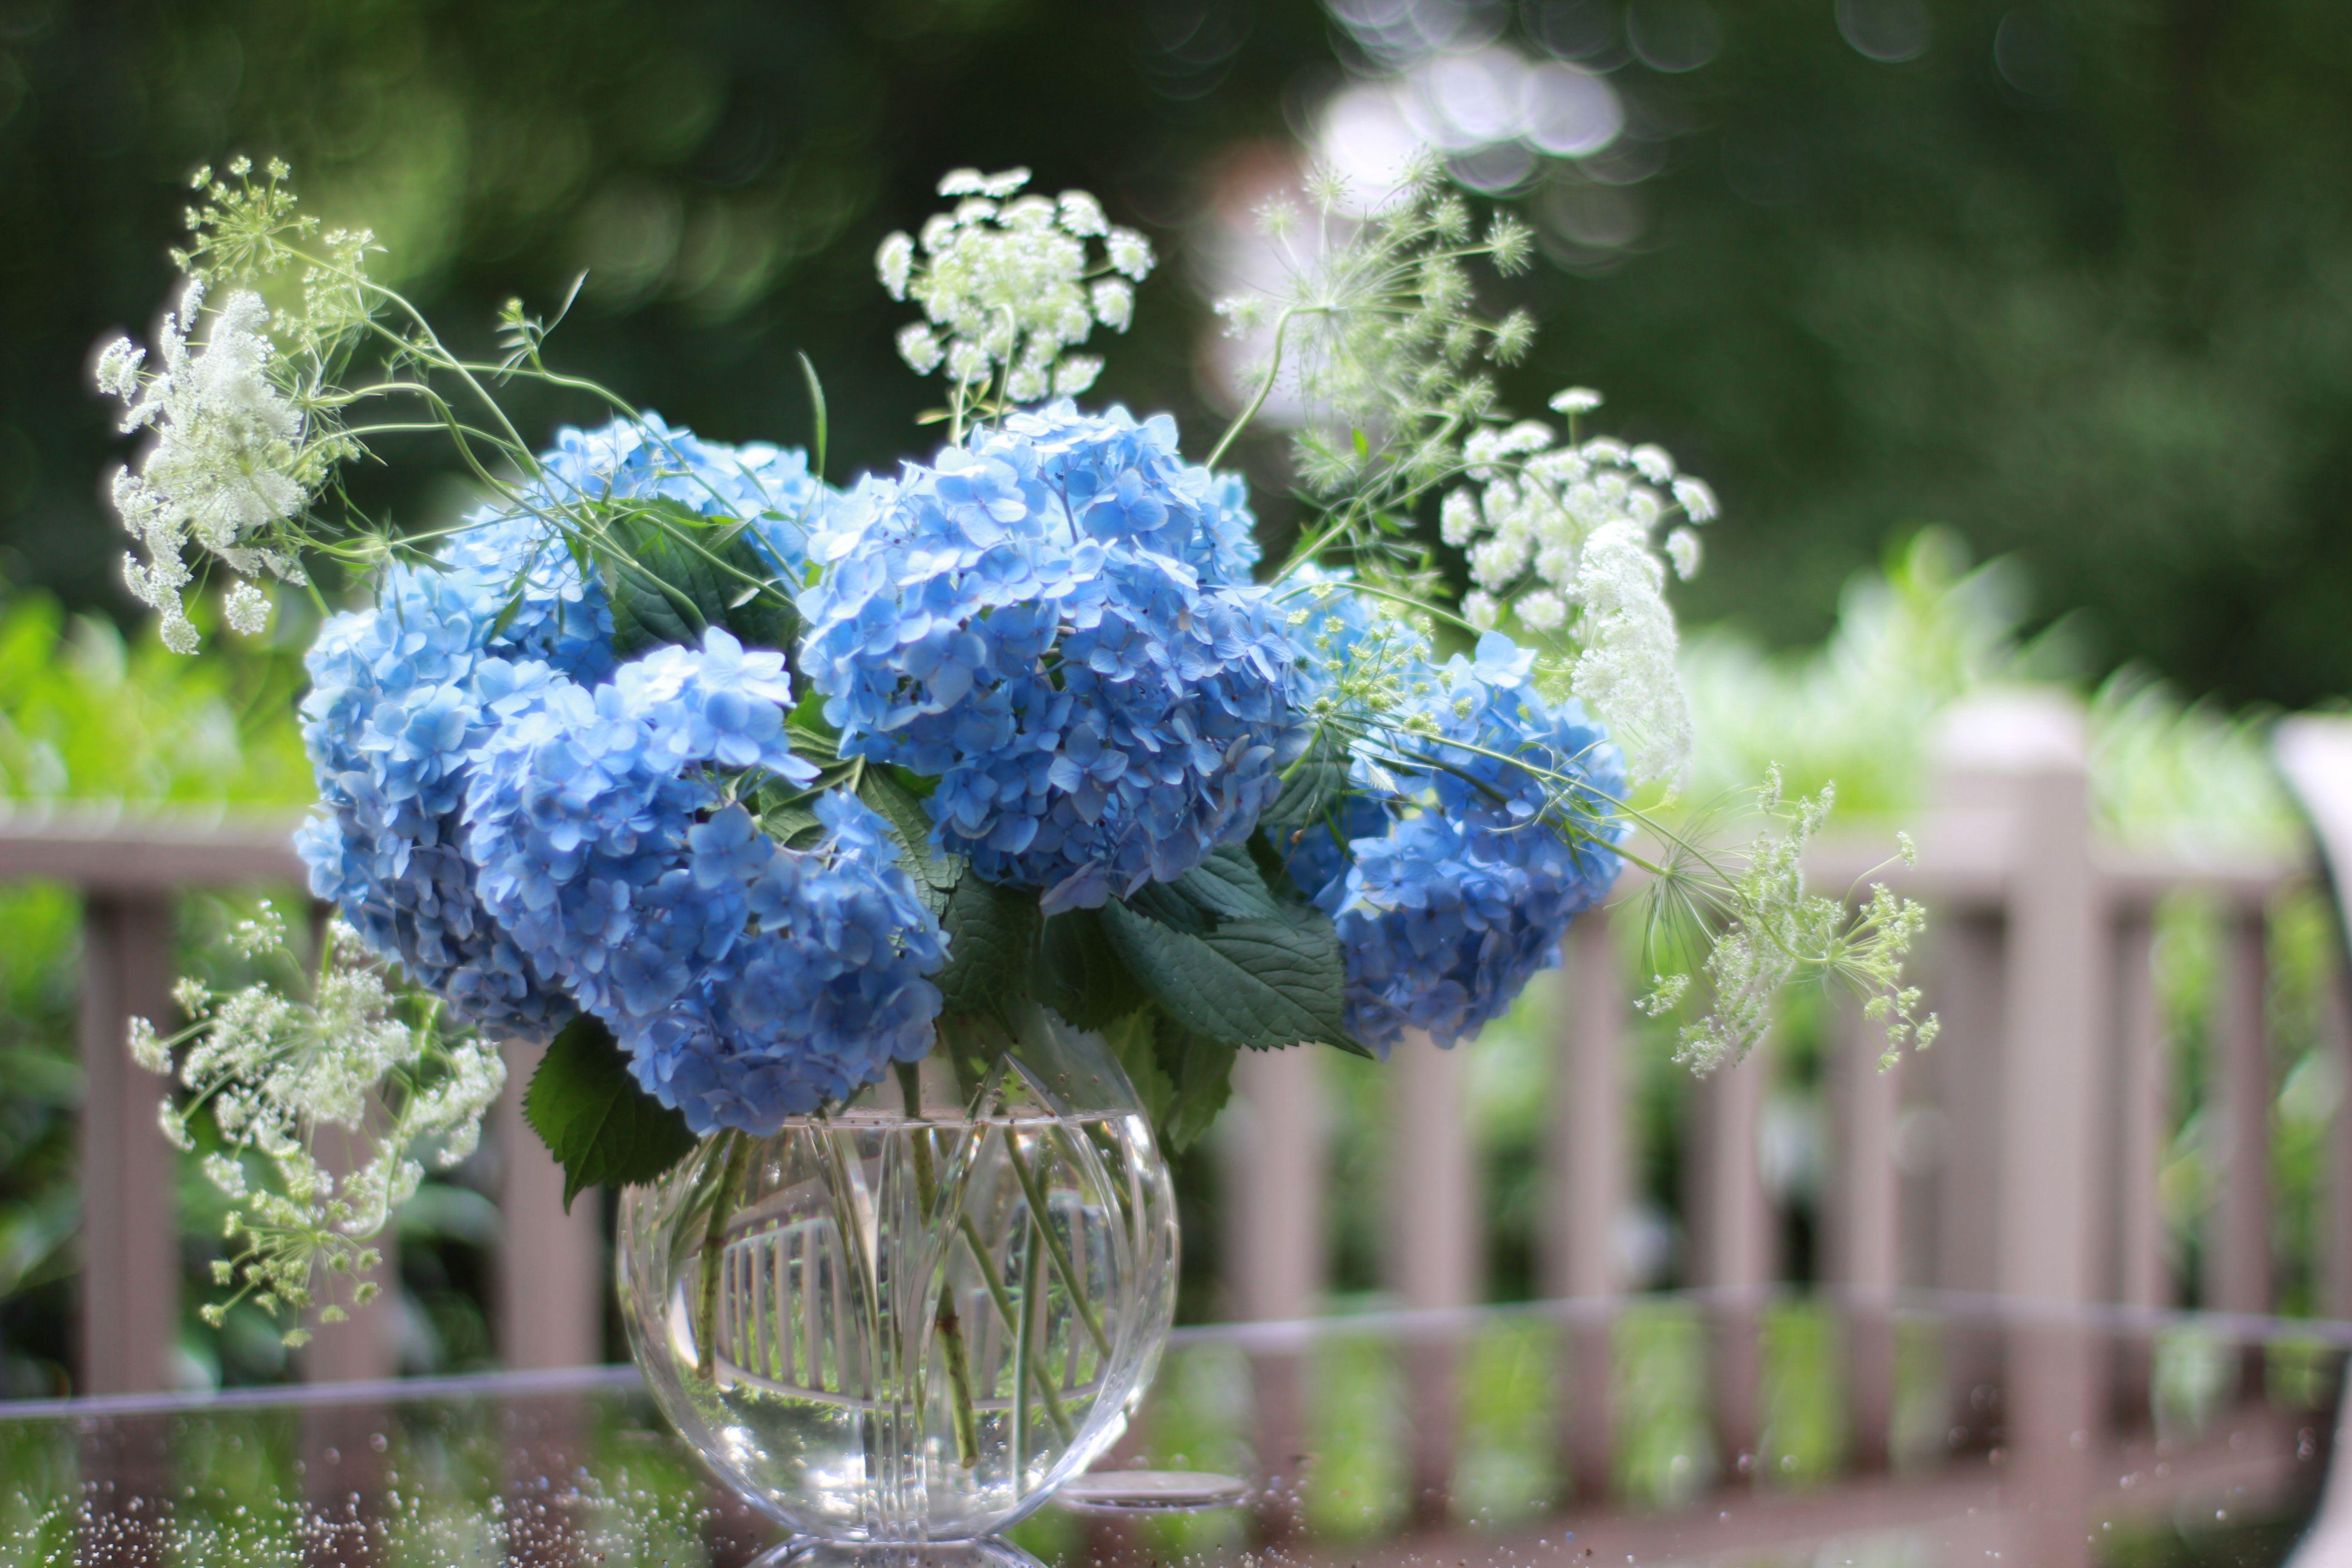 How To Keep Hydrangeas From Wilting Hydrangea Macrophylla Hydrangea Arrangements Hydrangea